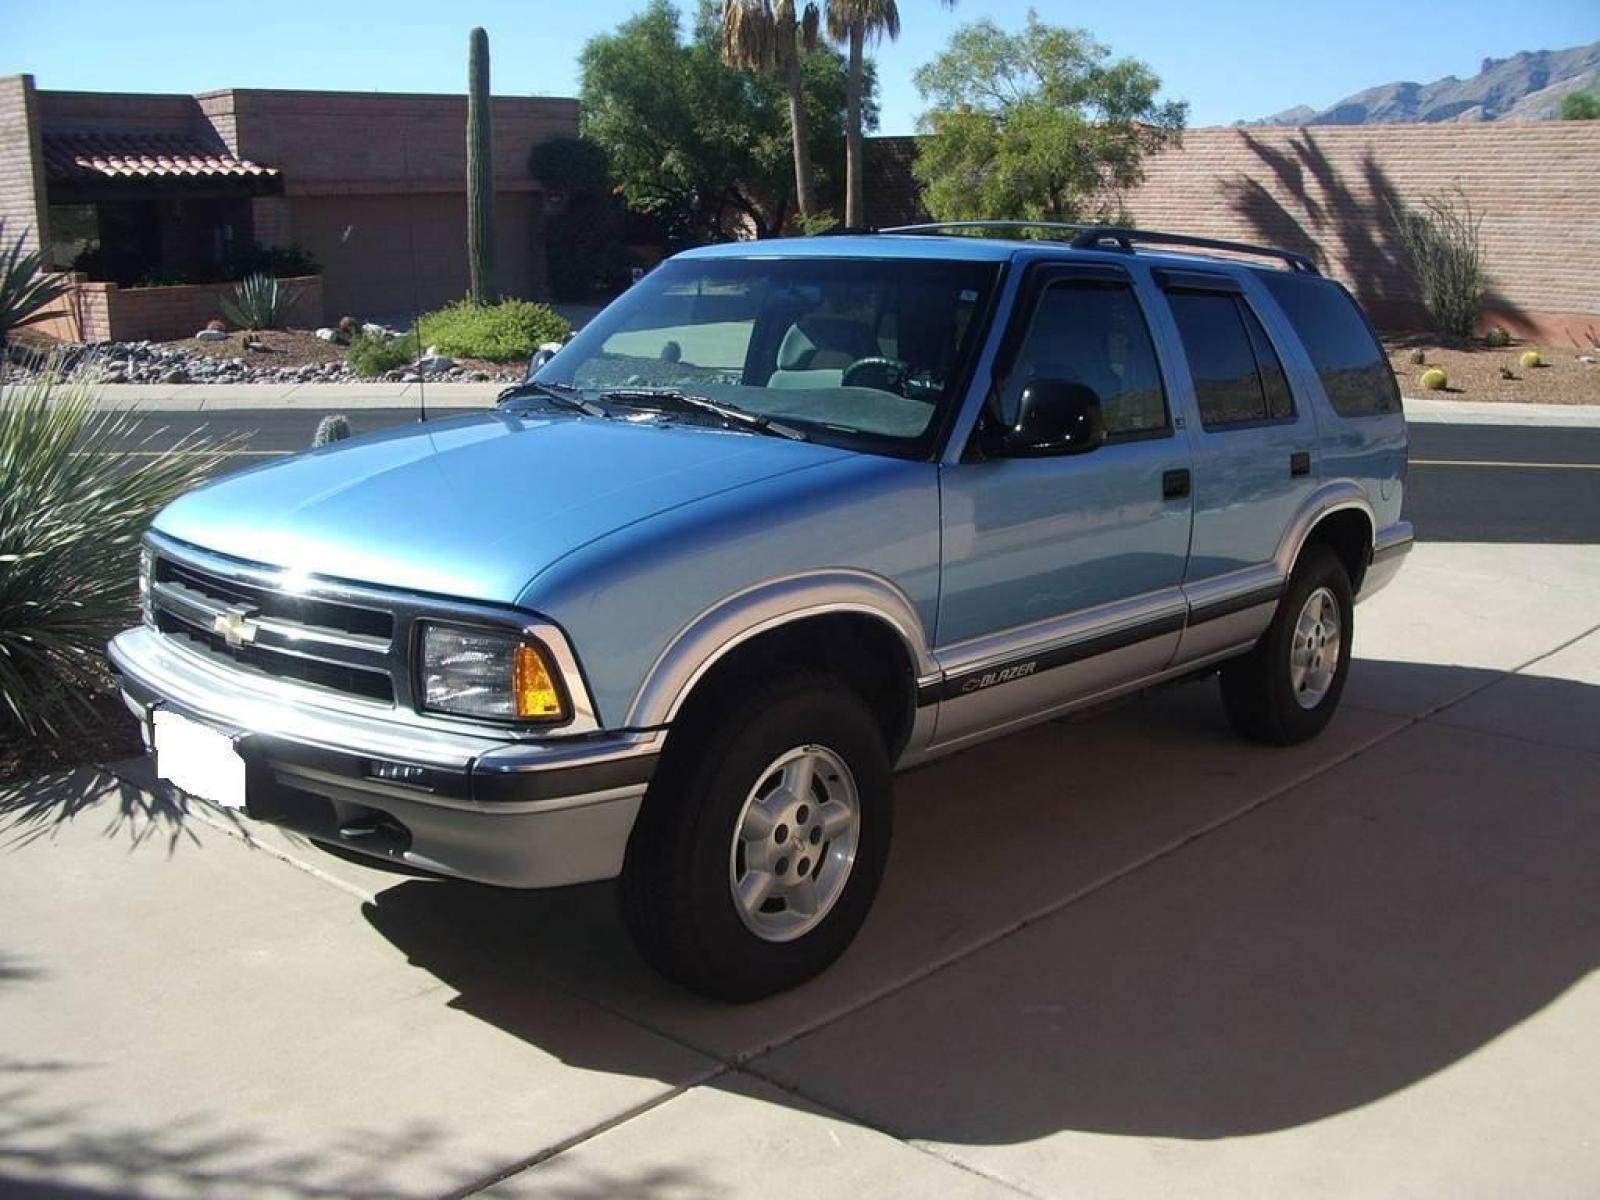 1997 Chevrolet Blazer Information And Photos Zombiedrive 1984 Pontiac Fiero Fuse Box Diagram 800 1024 1280 1600 Origin